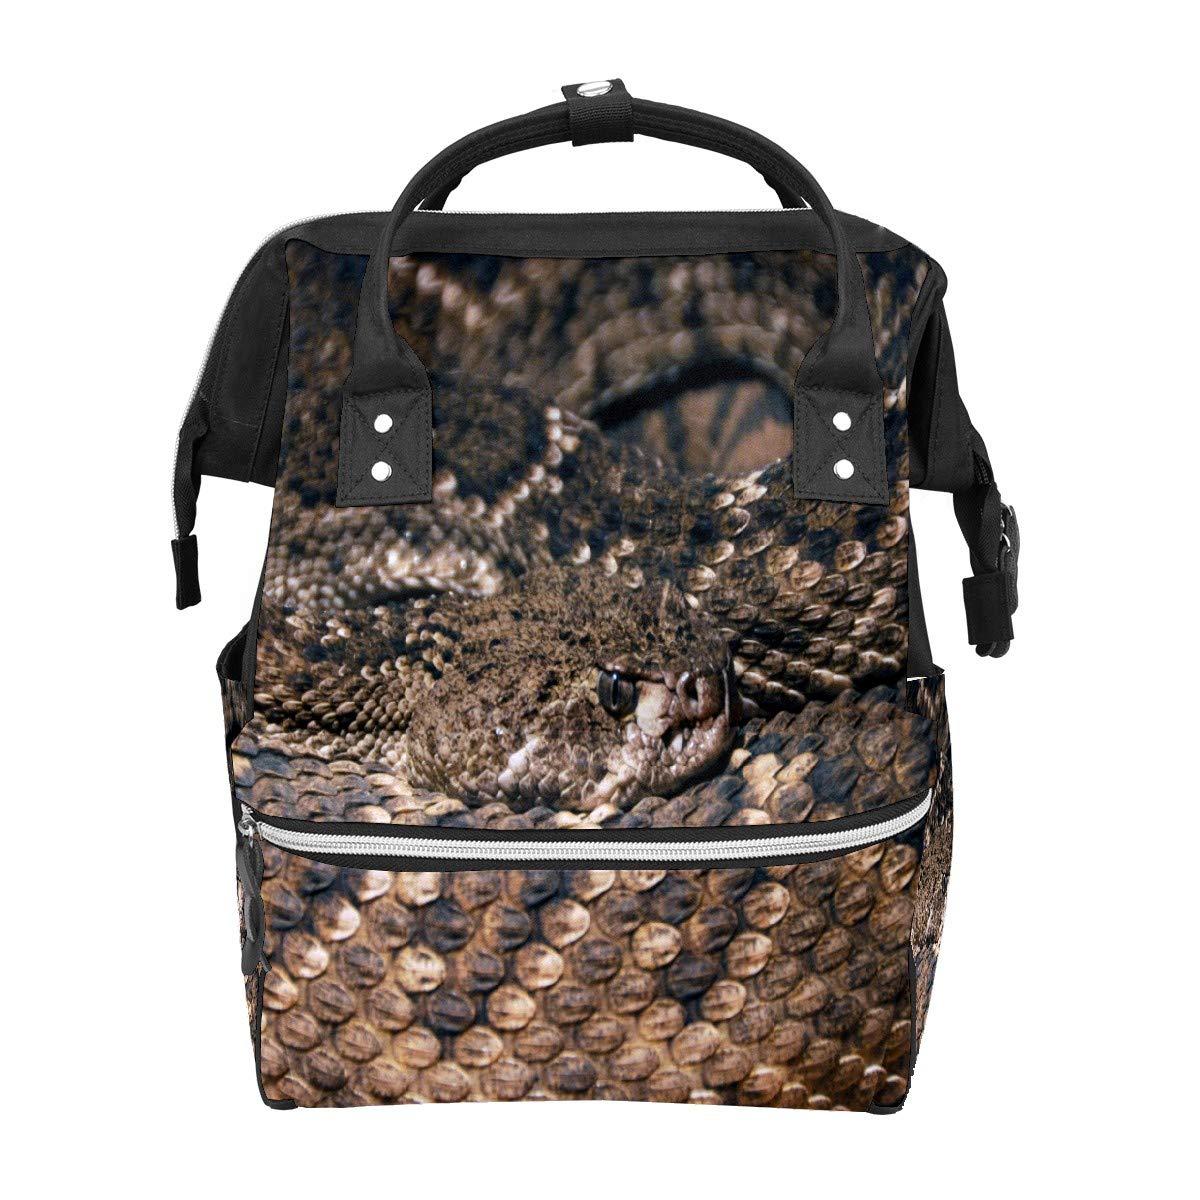 Diaper Bag Backpack Brown Snake Sleep Multifunction Travel Back Pack Baby Changing Bags Large Capacity Waterproof Stylish